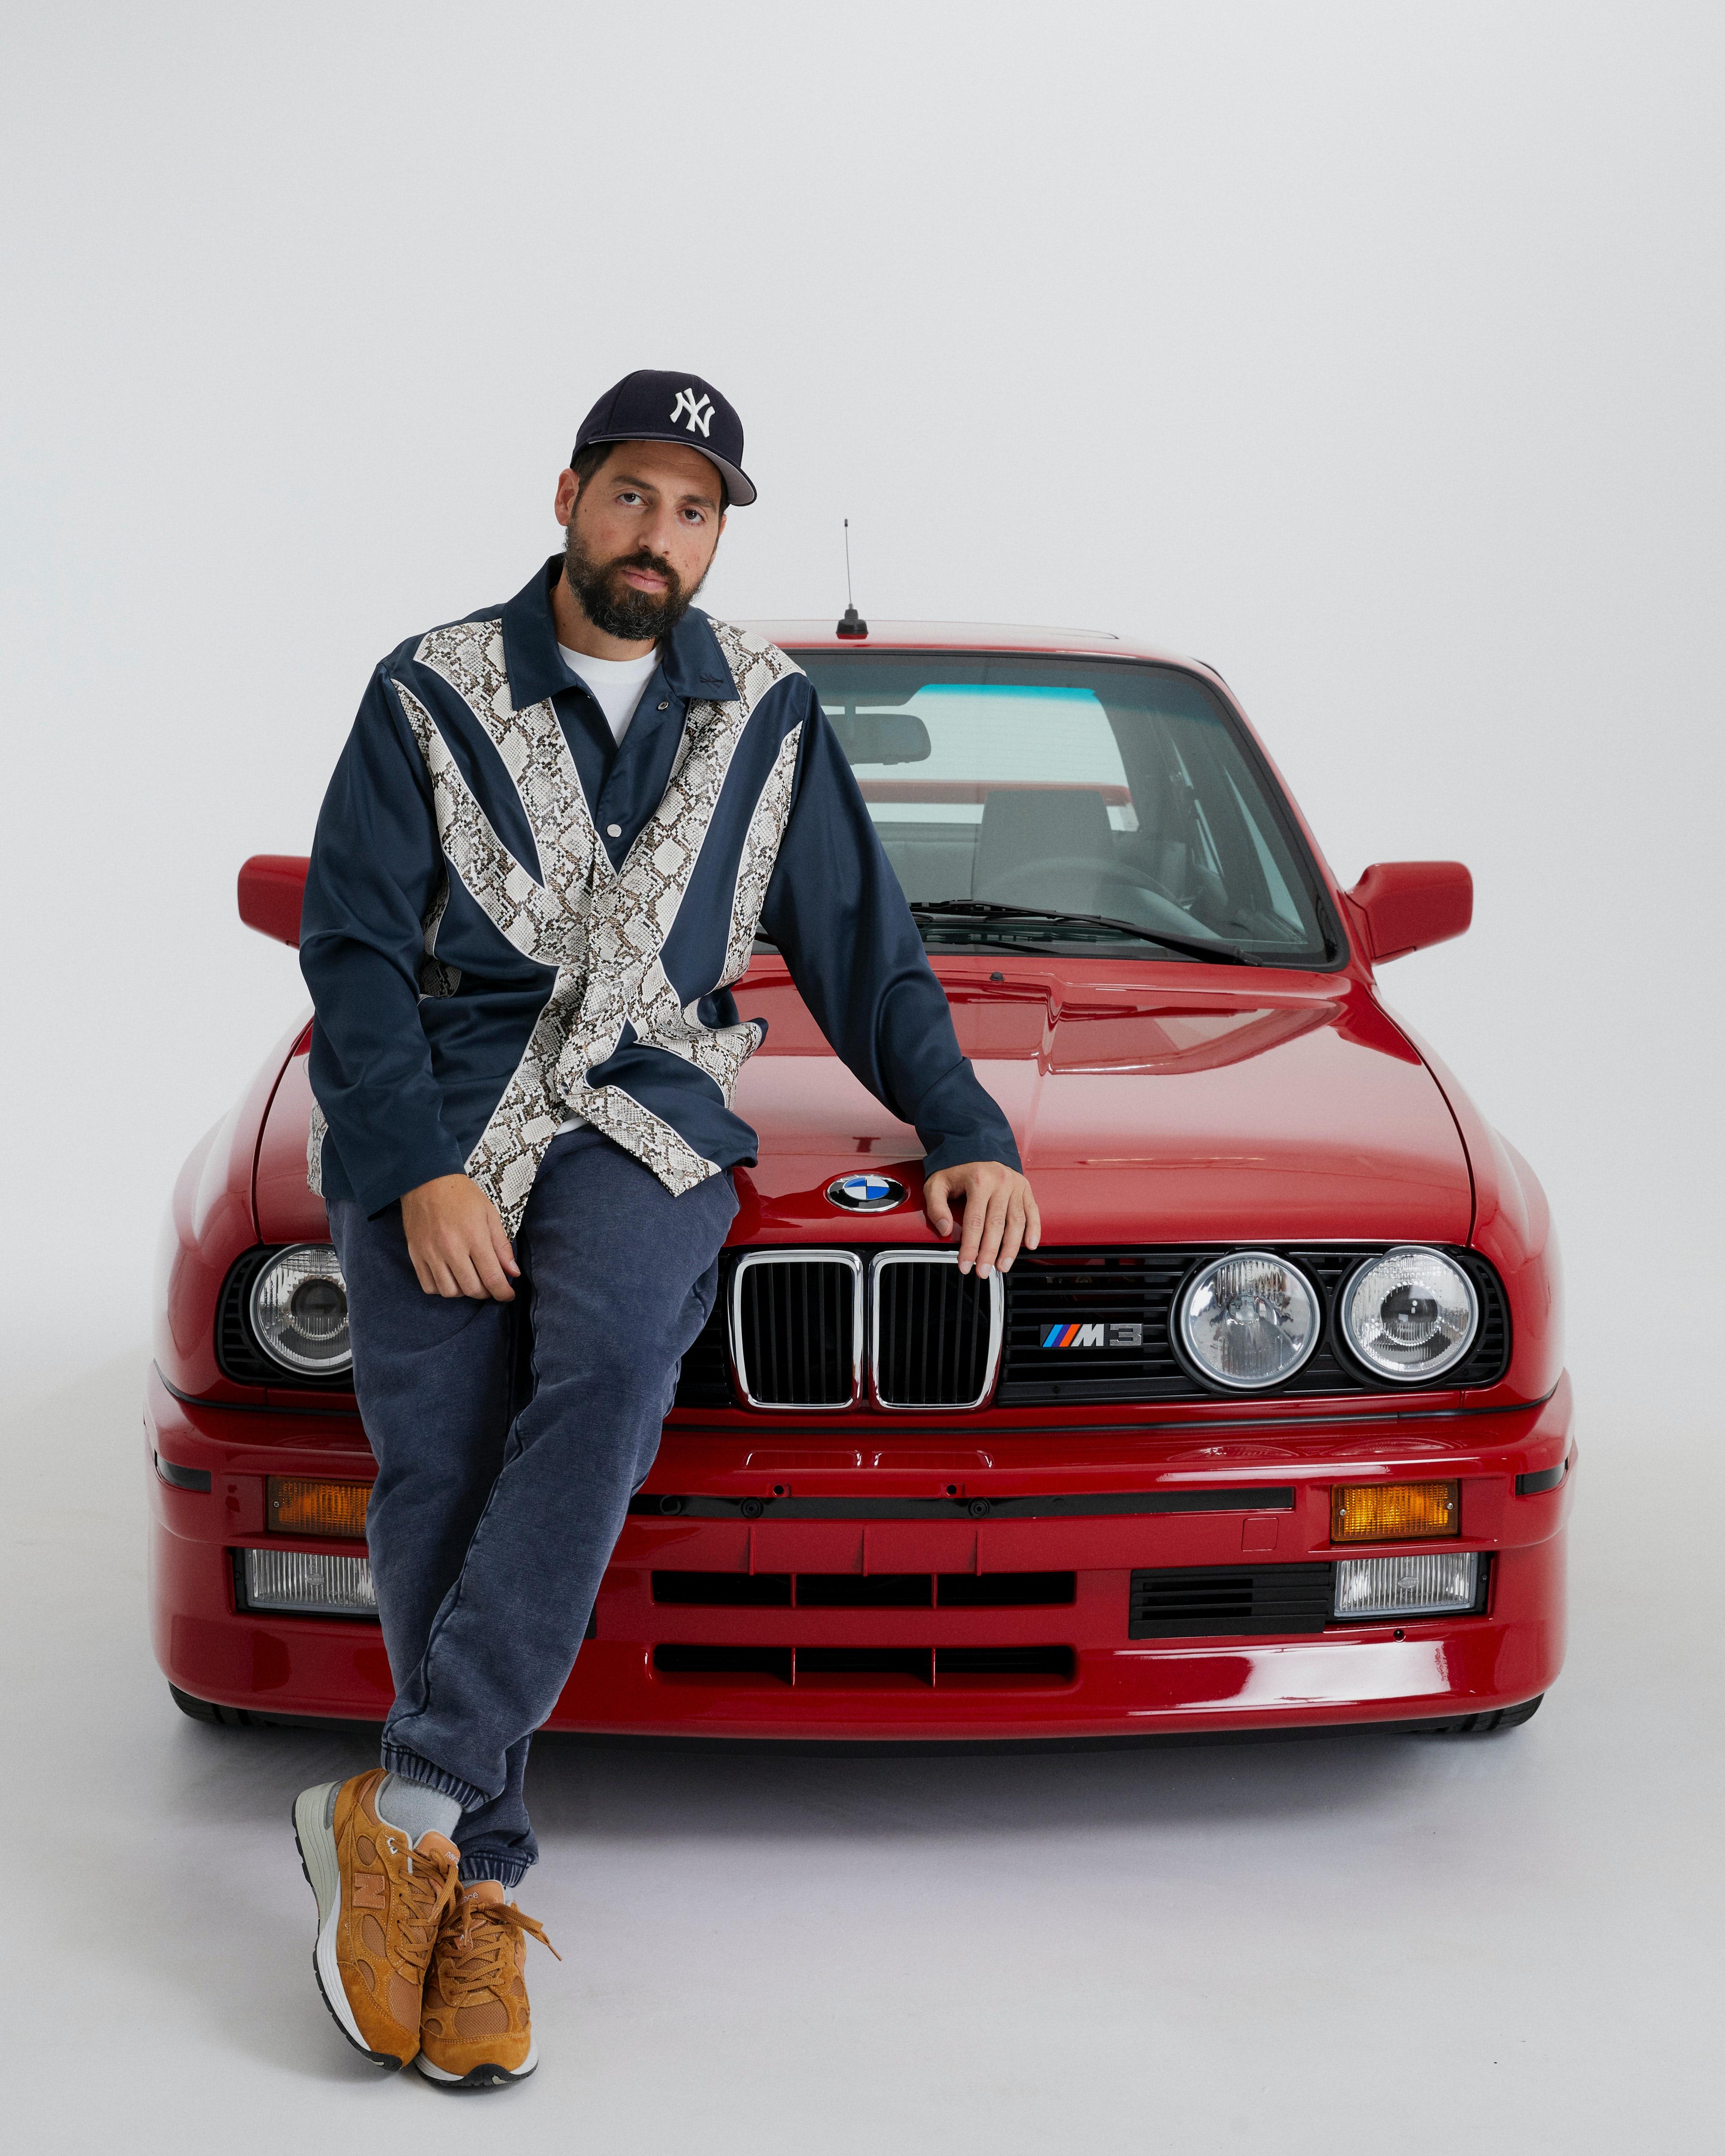 Kith\'s founder, chief executive and creative director Ronnie Fieg. Kith